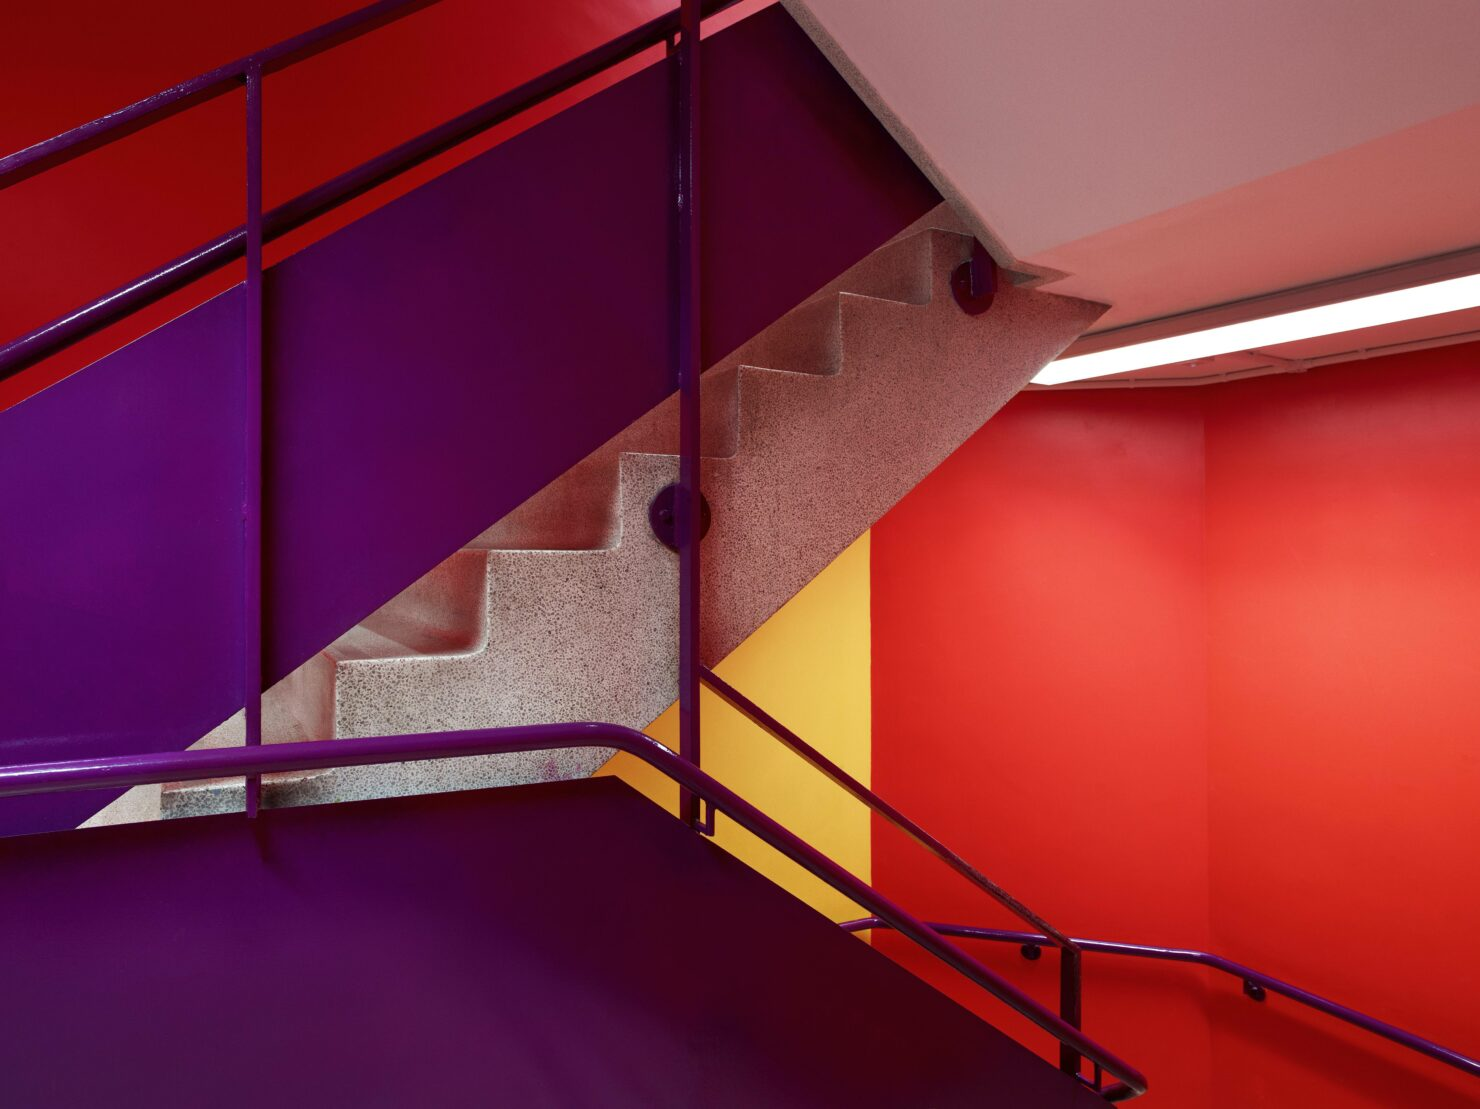 ipad-pro-5k-wallpaper-gallery-6